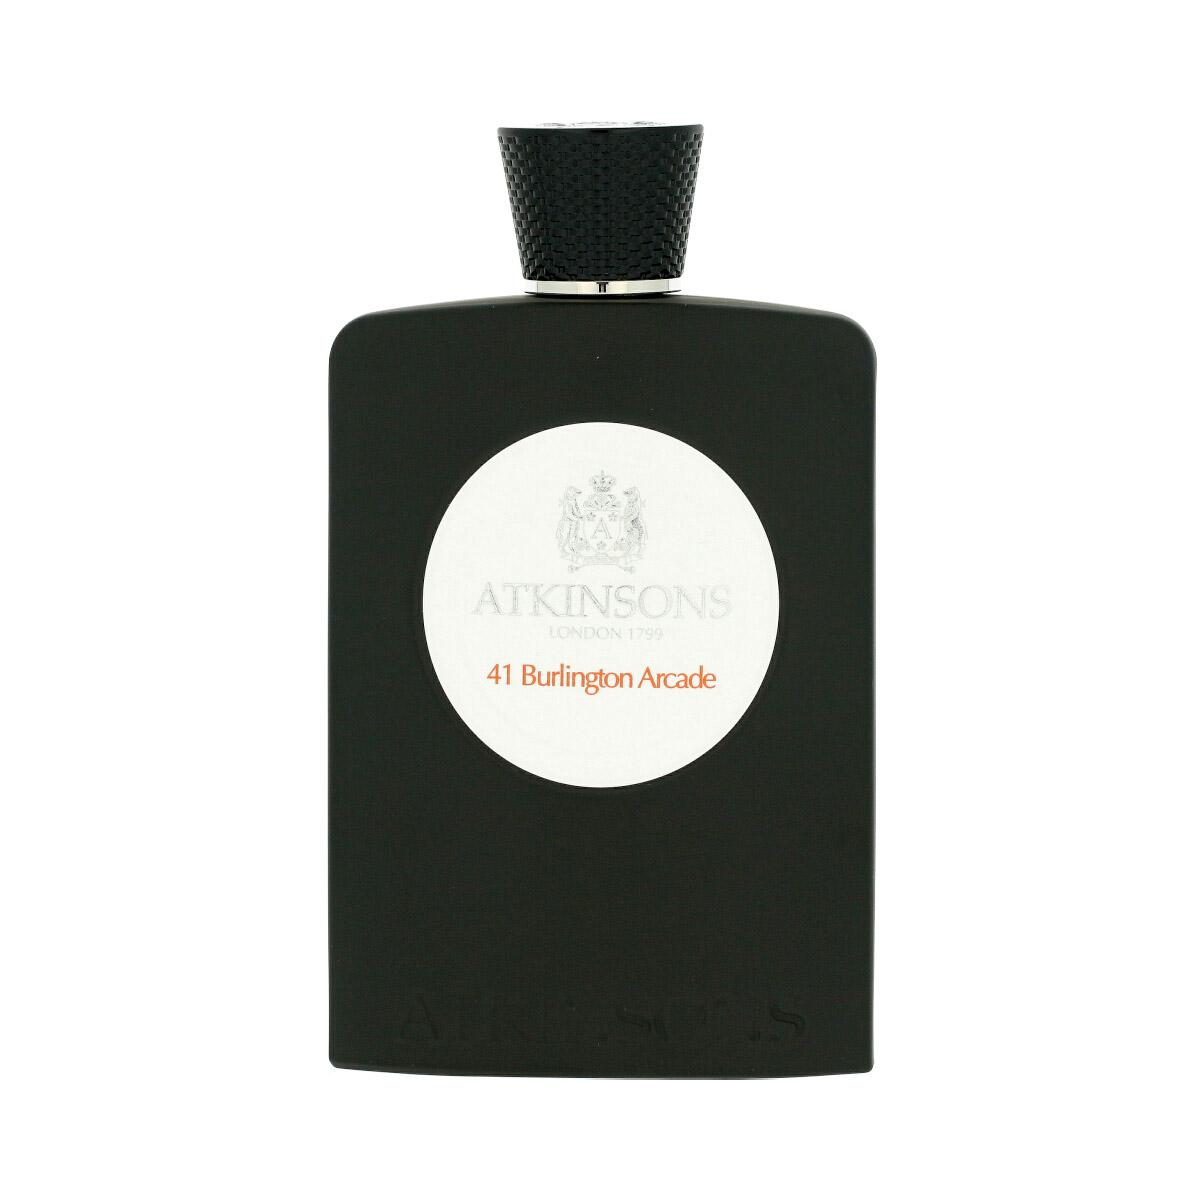 Atkinsons 41 Burlington Arcade Eau De Parfum 100 ml (unisex) 18521